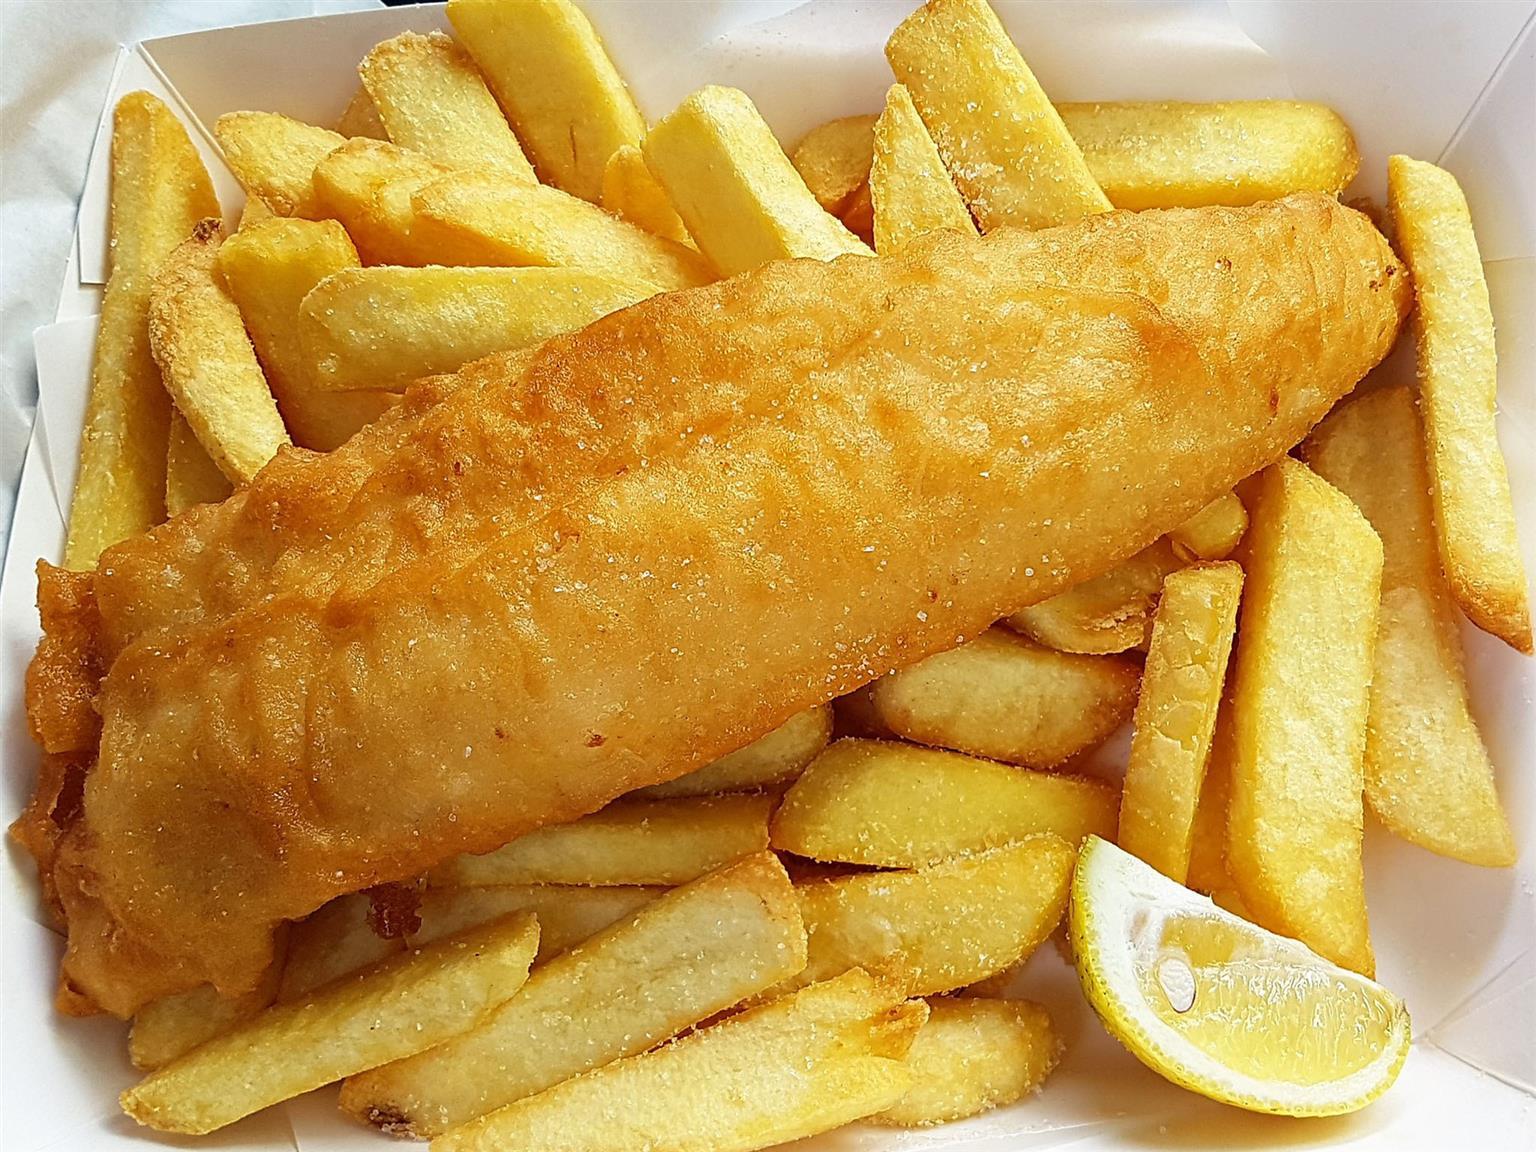 Fish & Chips Shop (Lambton)